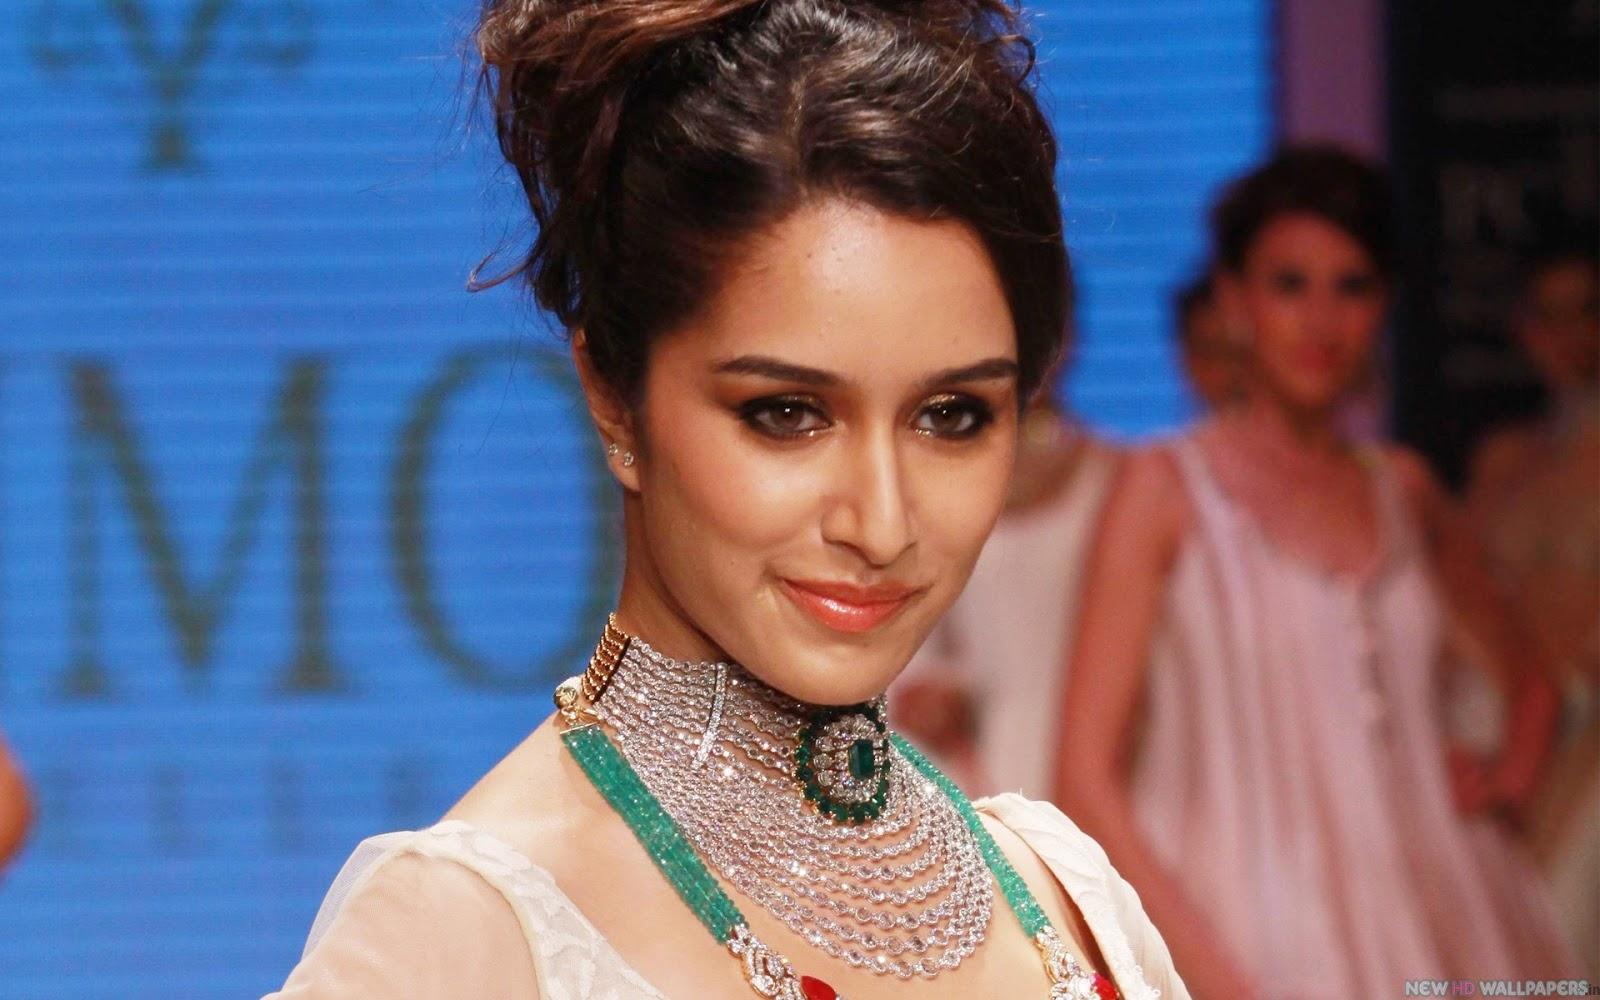 Hd wallpaper bollywood - 16 Best Full Hd Wallpapers Of Indian Bollywood Actress Sharadha Kapoor